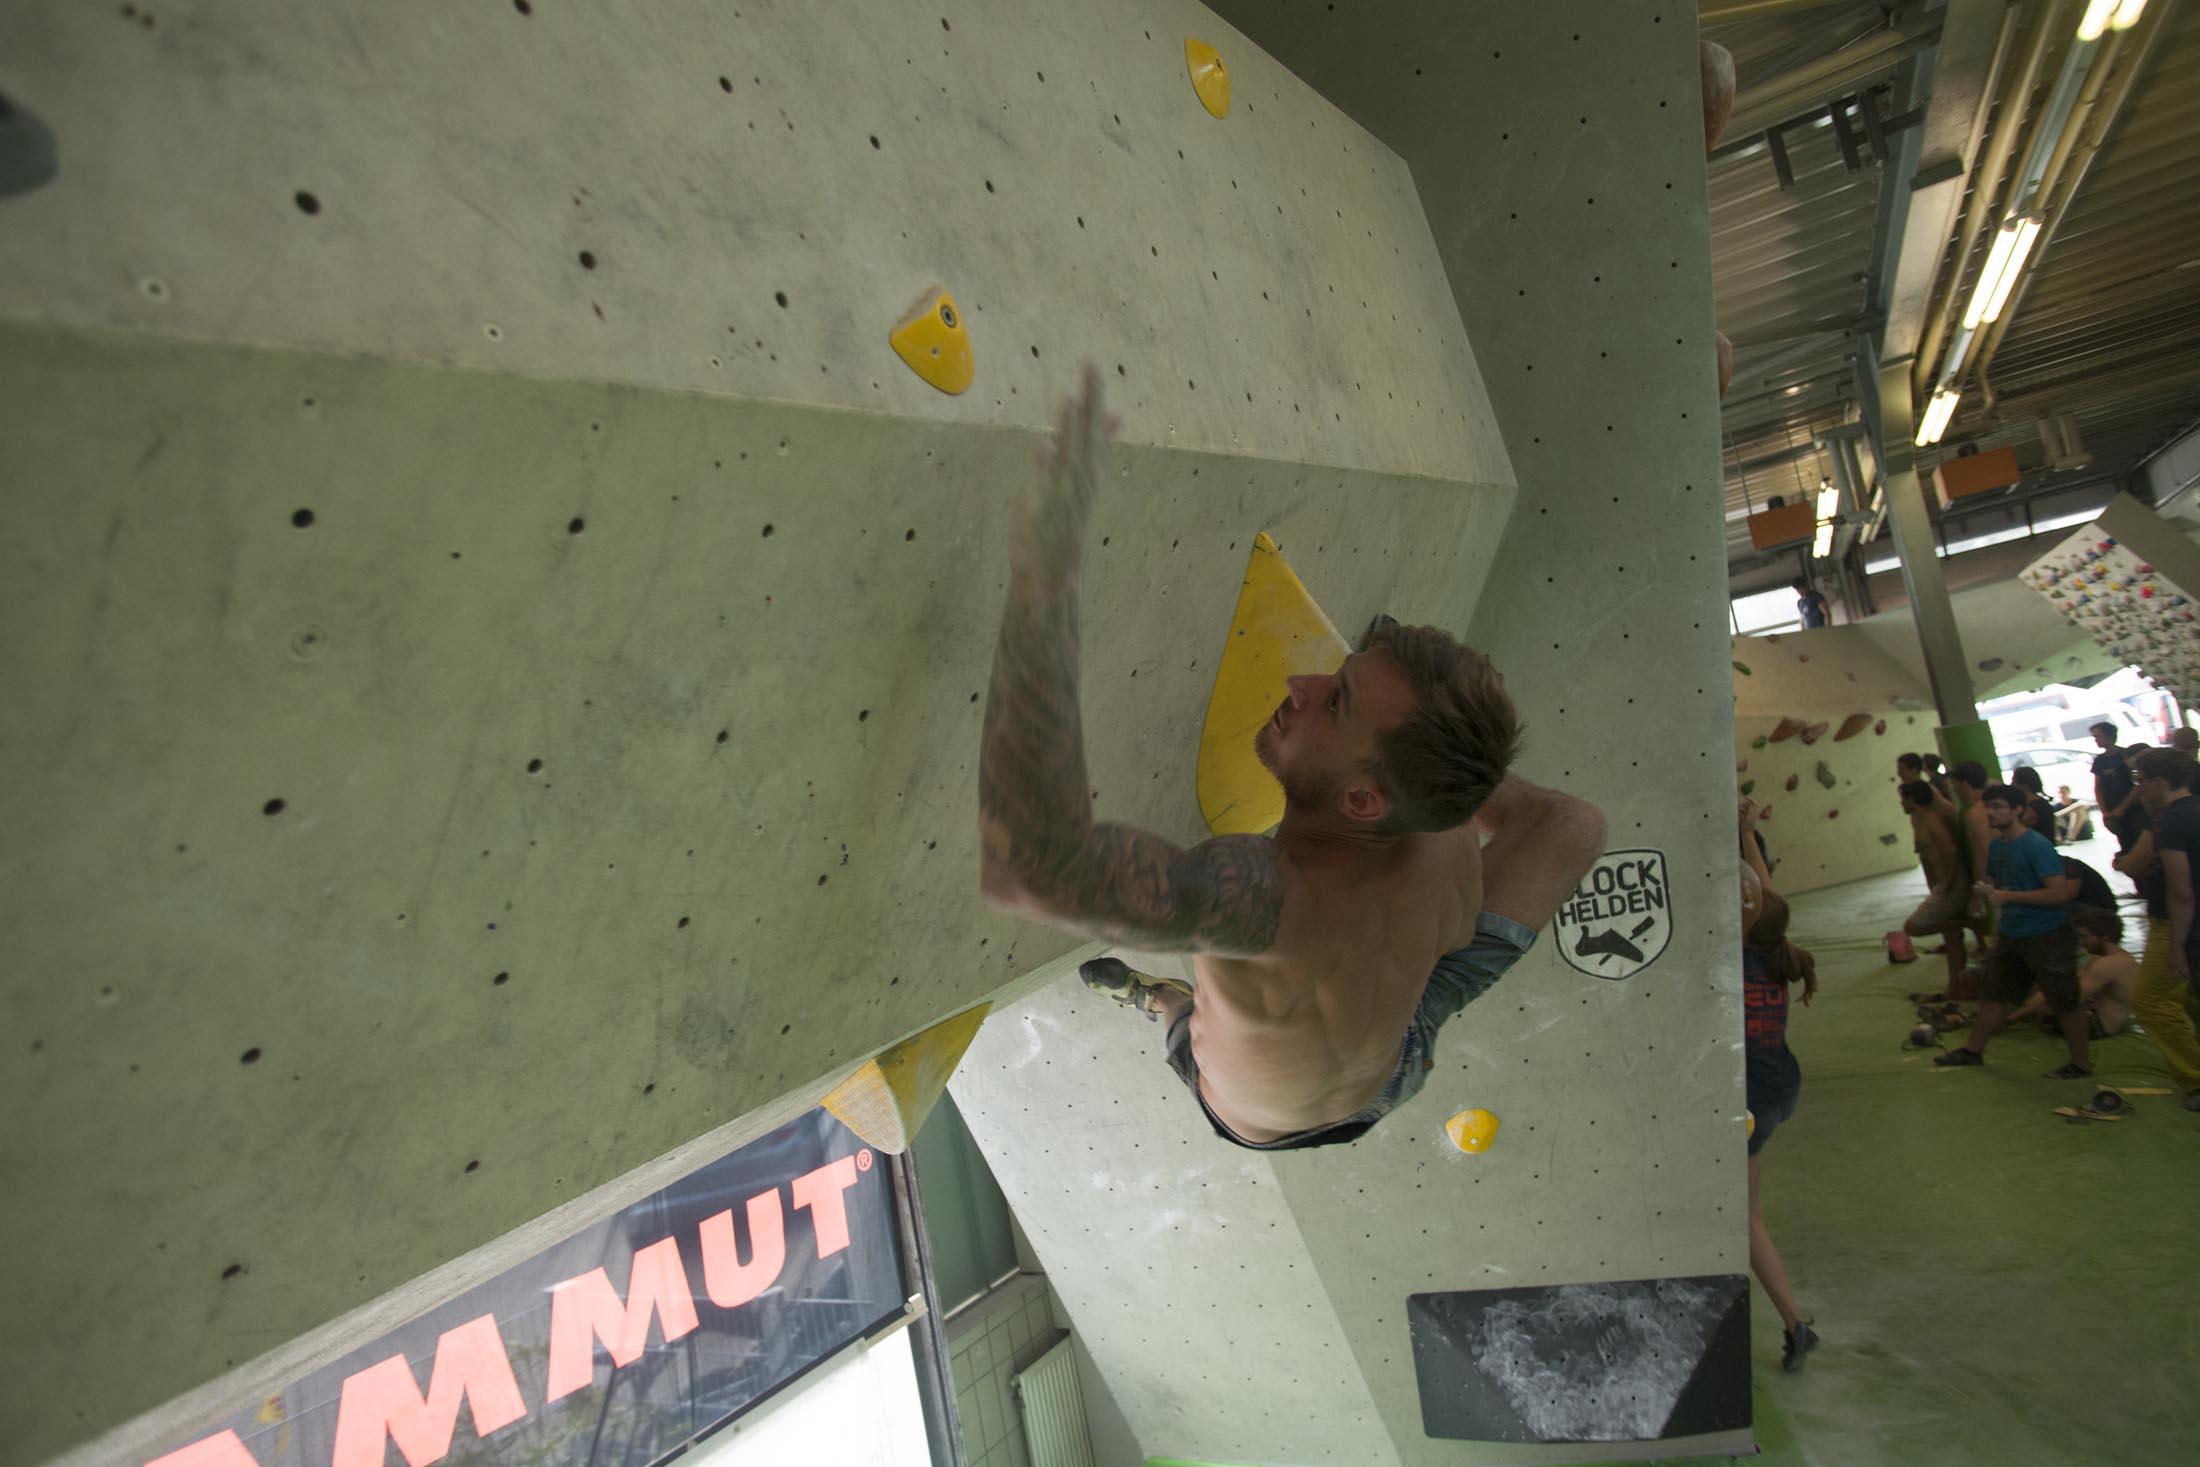 Quali, internationaler bouldercup Frankenjura 2016, BLOCKHELDEN Erlangen, Mammut, Bergfreunde.de, Boulderwettkampf07092016361